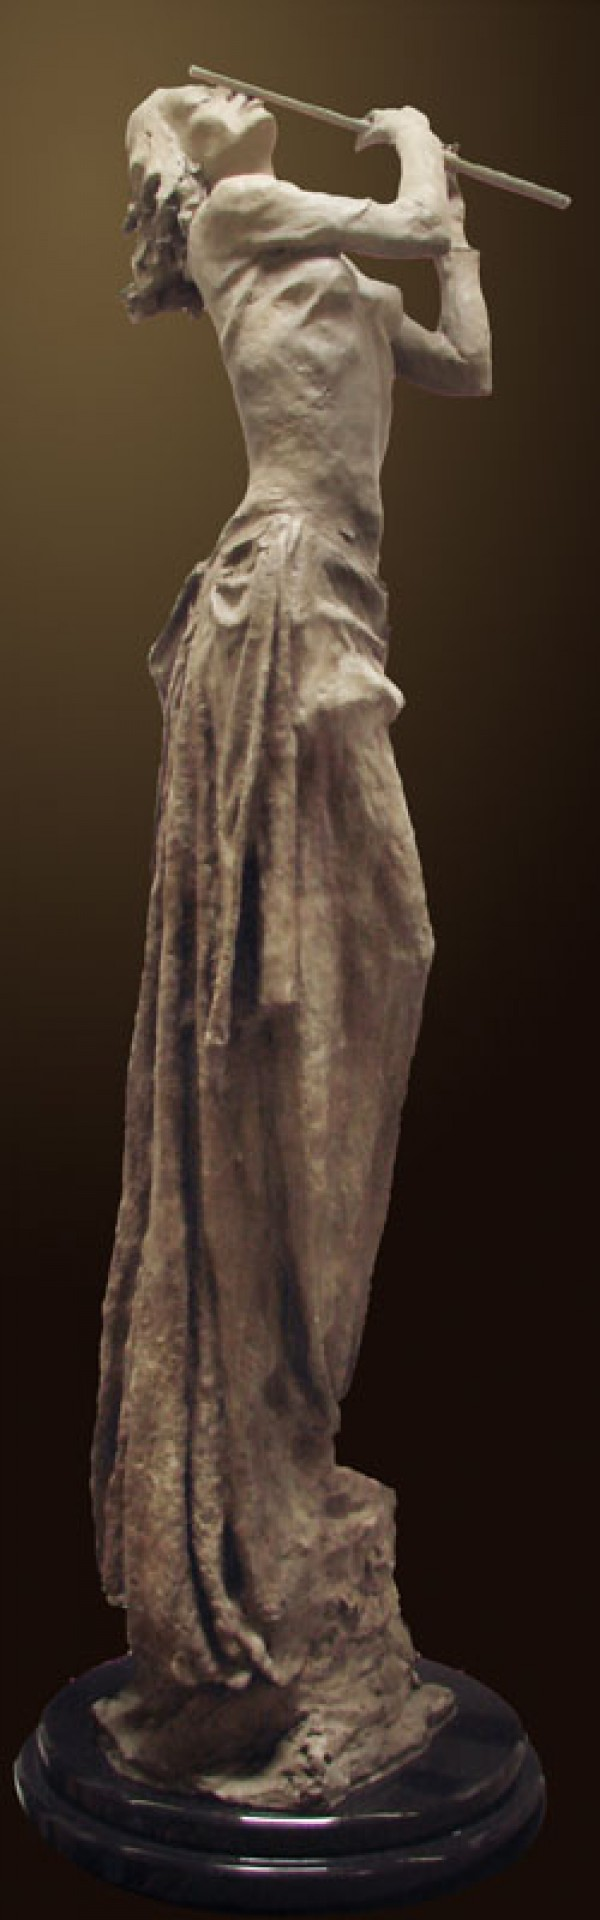 """Meditation"" bronze sculpture by Tuan"